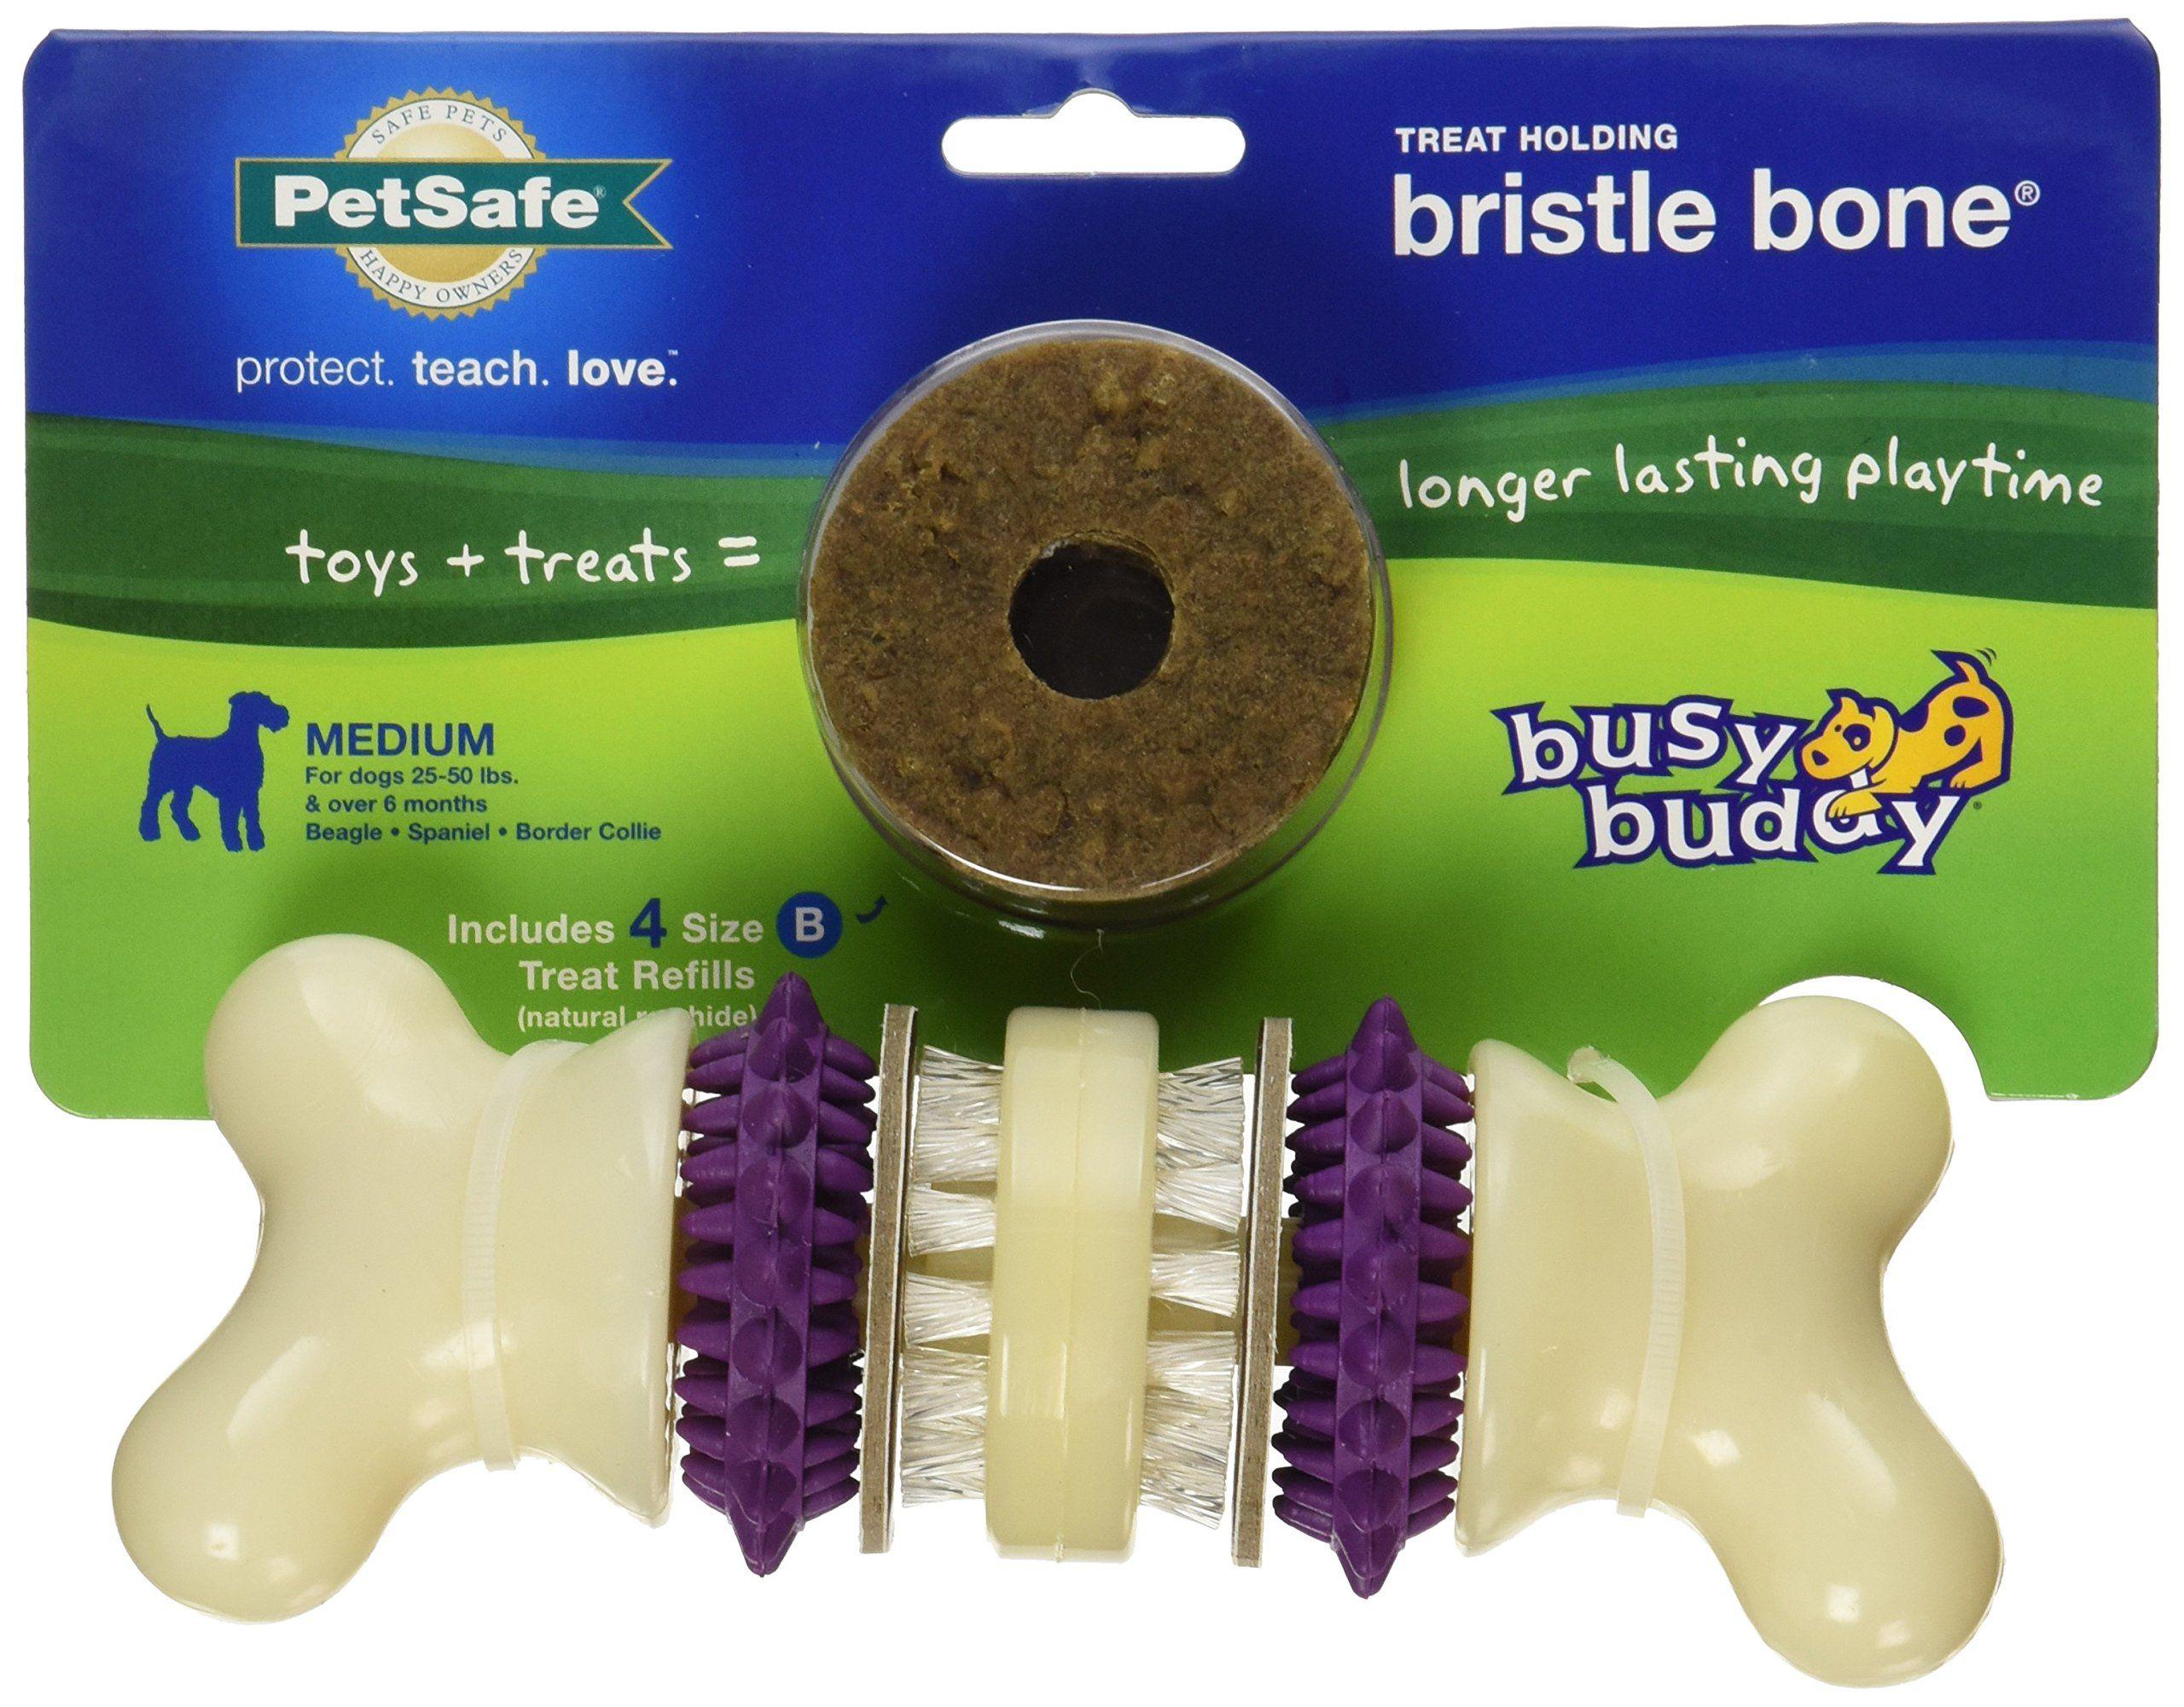 Petsafe Busy Buddy Bristle Bone Dog Toy Medium More Info Could